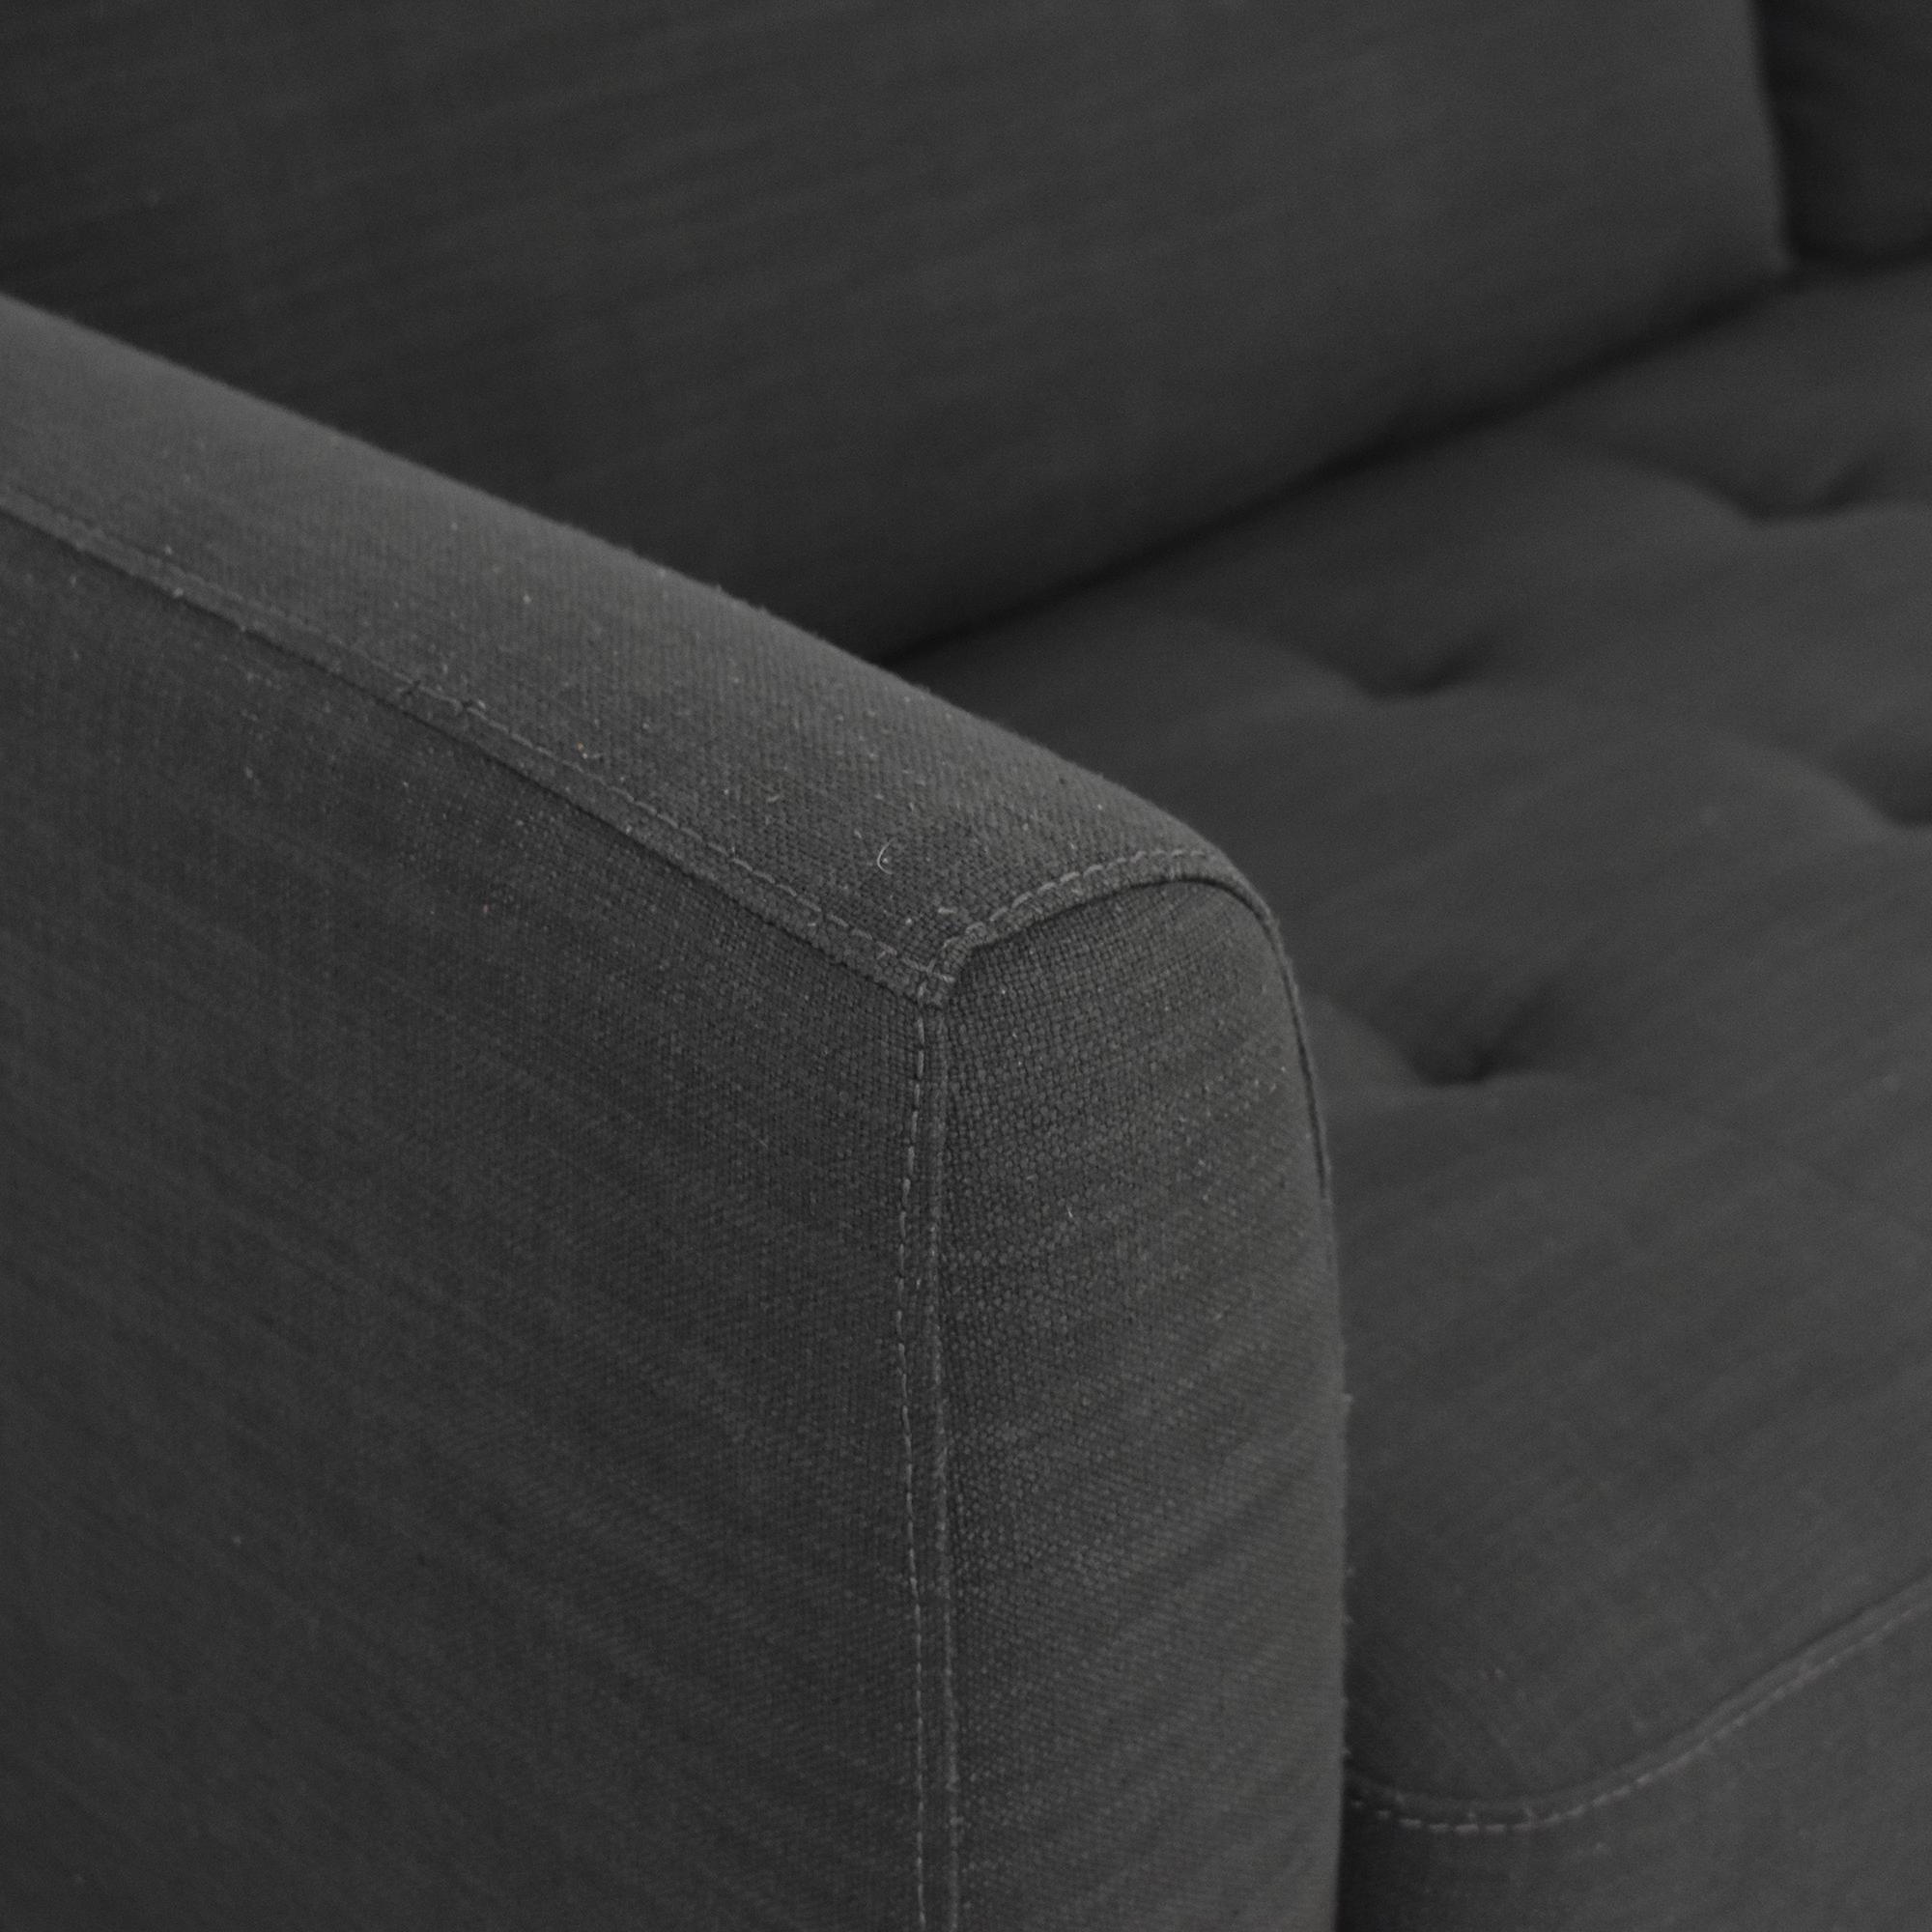 Macy's Macy's Mid Century Modern Sofa for sale